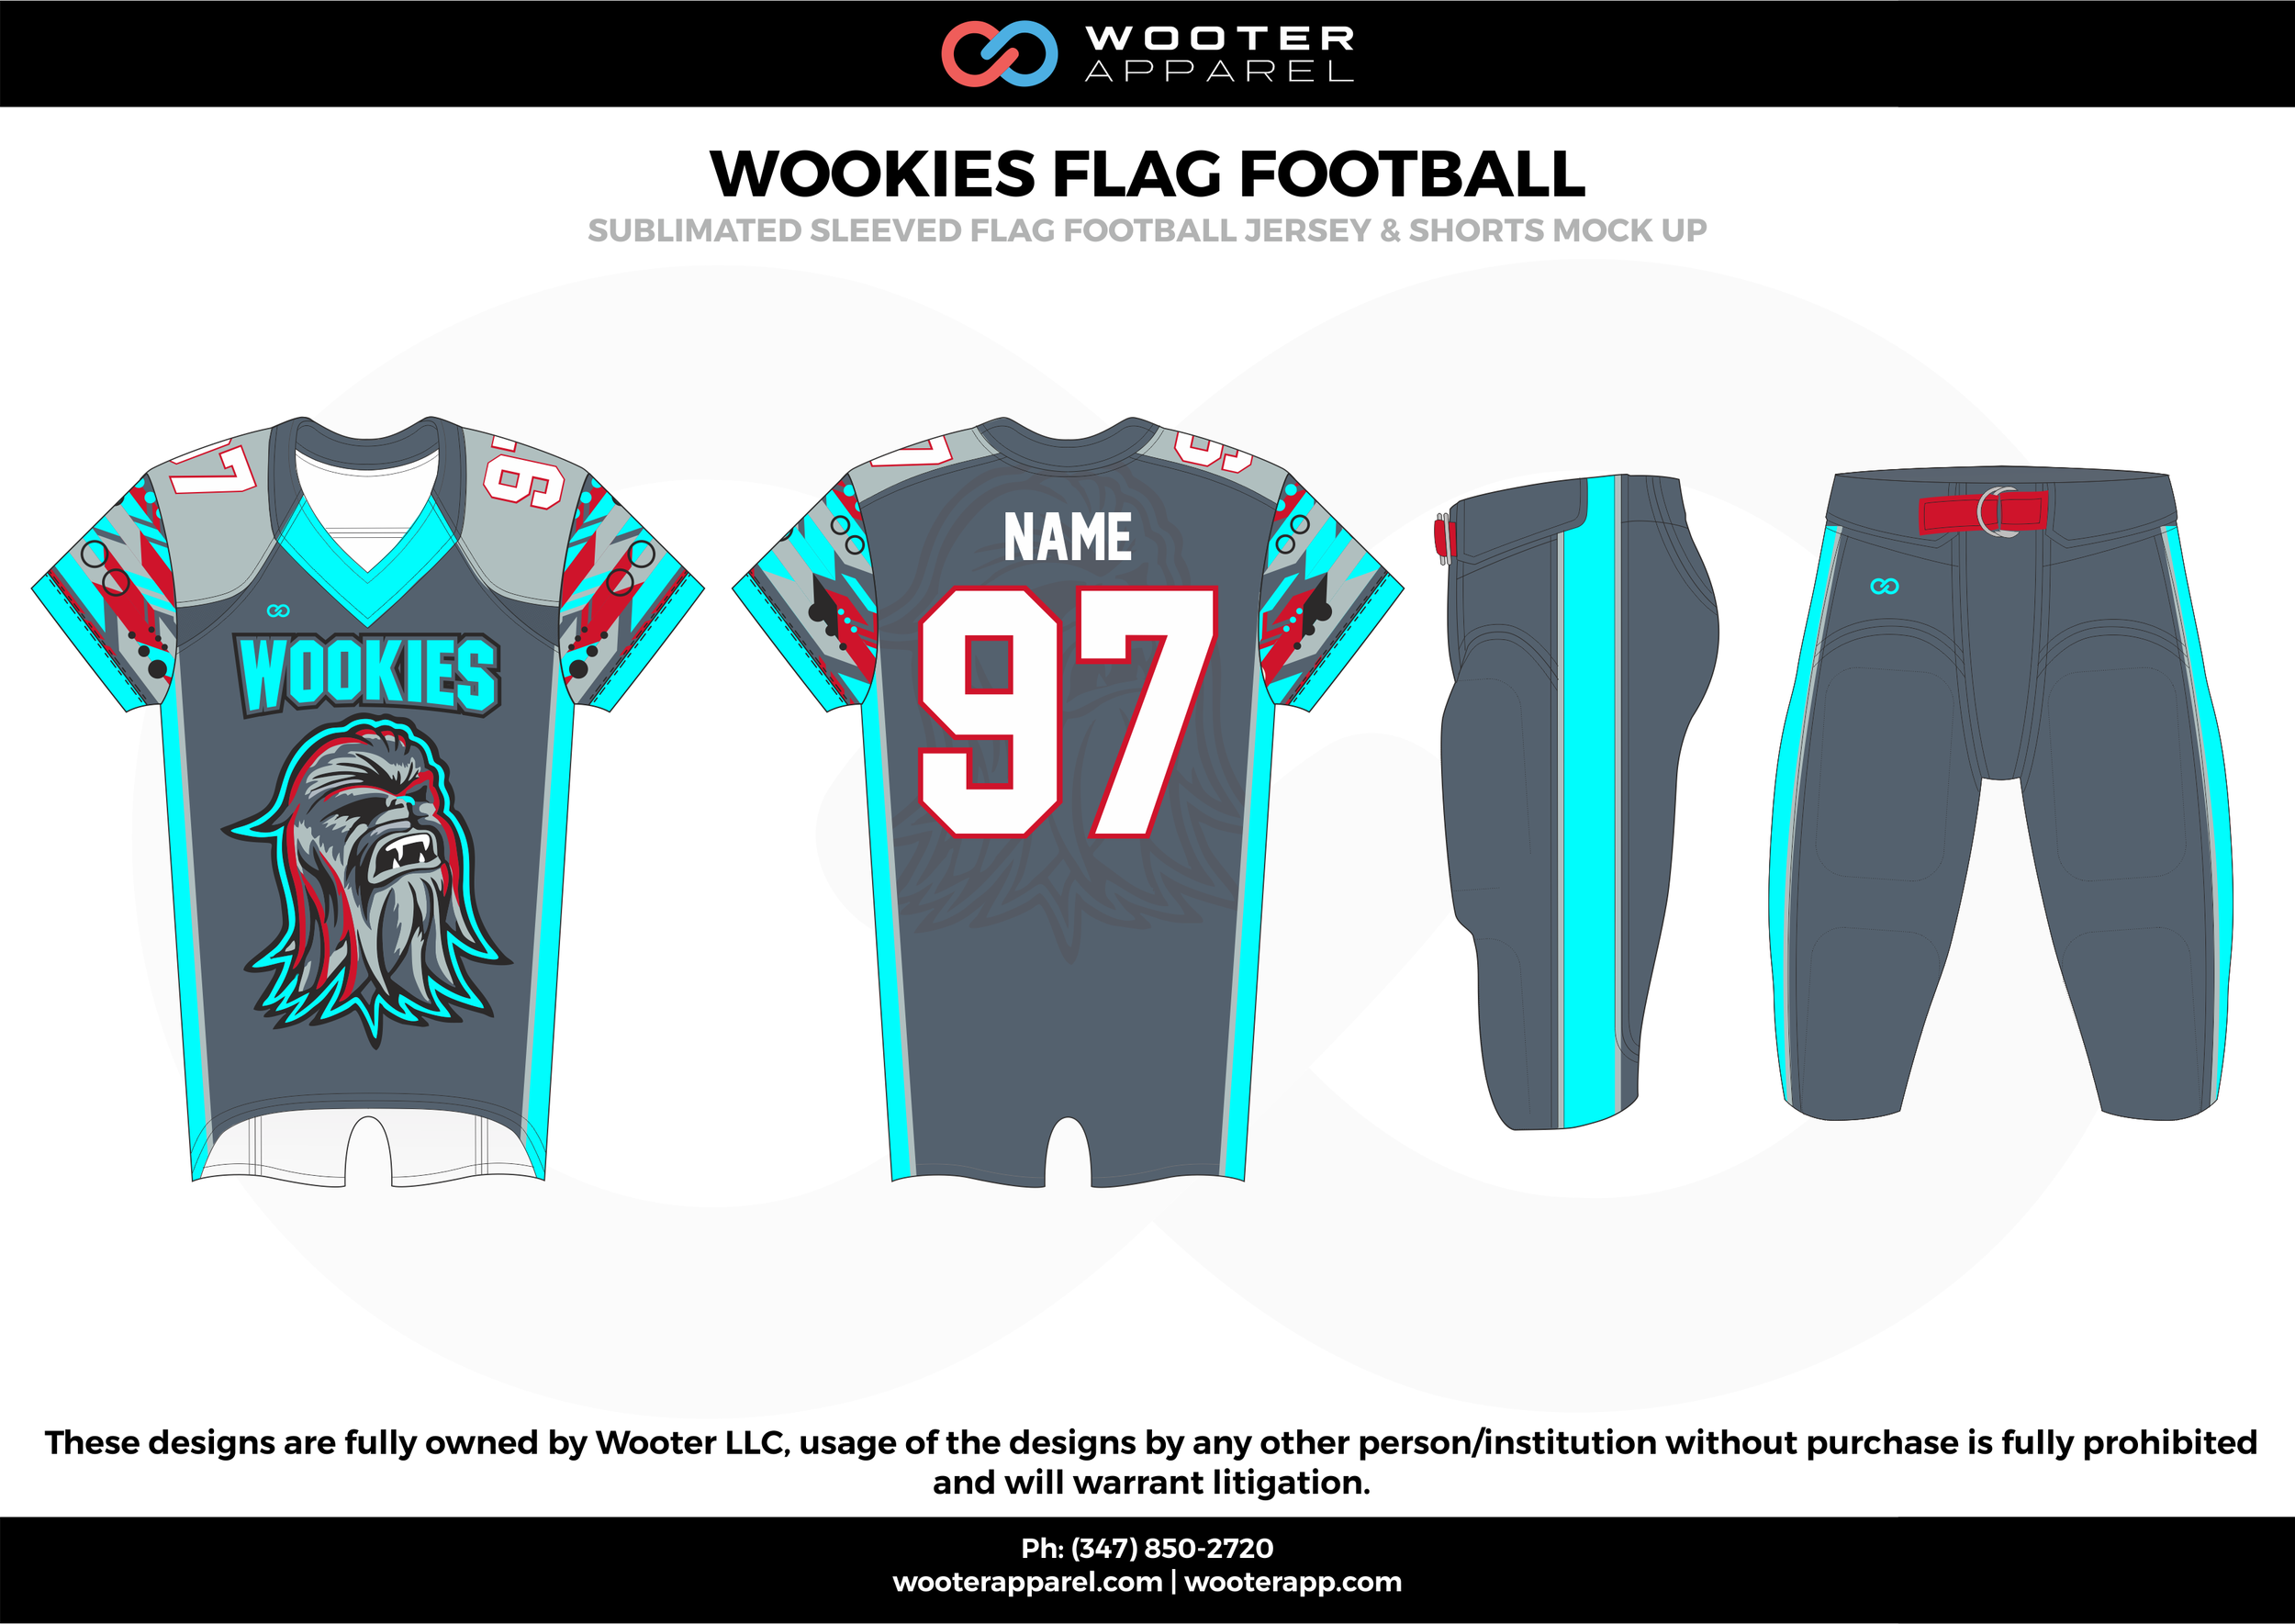 WOOKIES FLAG FOOTBALL gray cyan green red white flag football uniforms jerseys pants